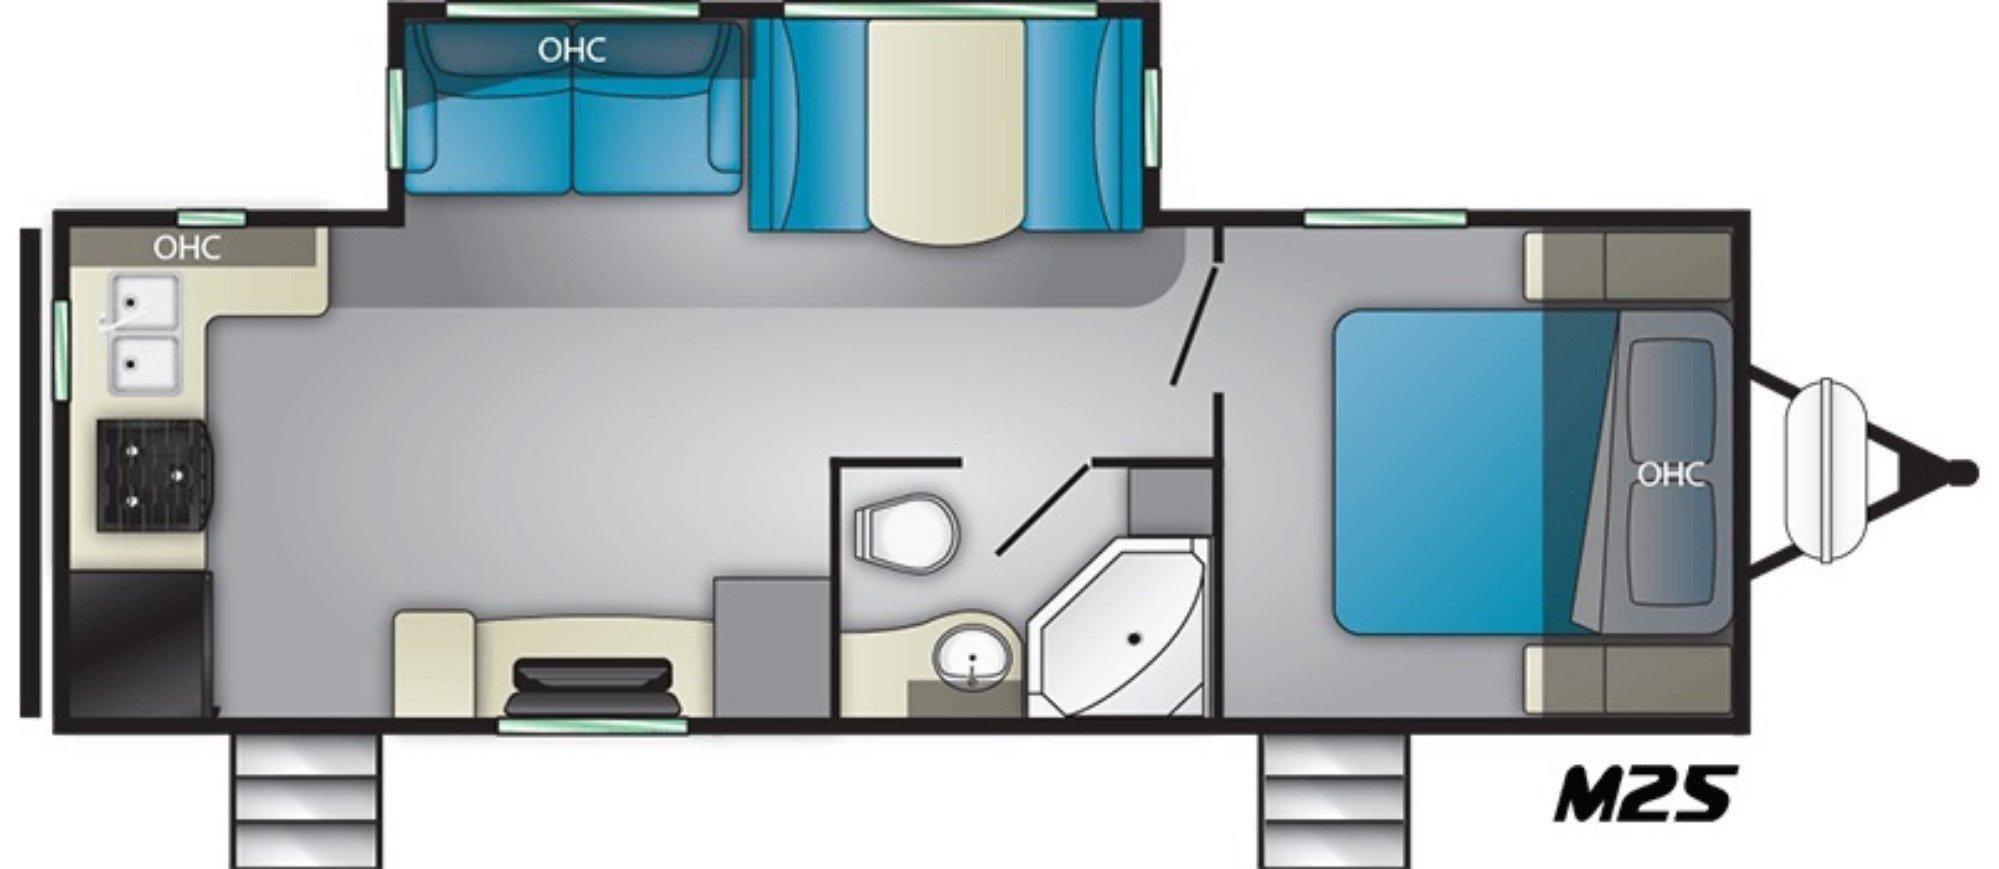 View Floor Plan for 2020 HEARTLAND MALLARD M25